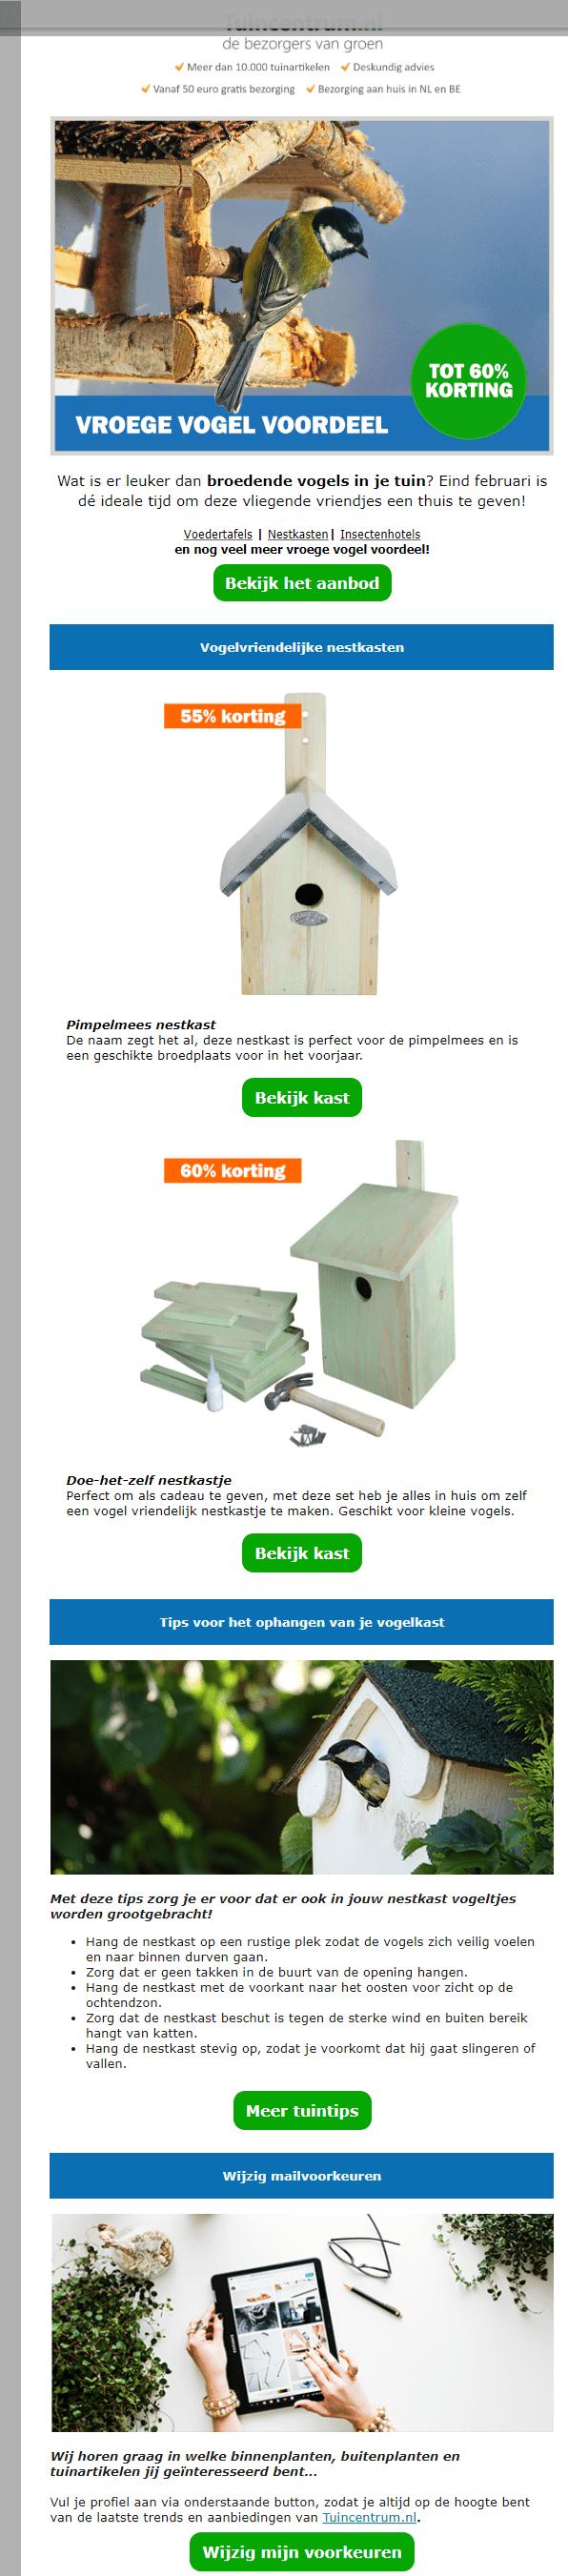 Image of a newsletter with bird house assemblies